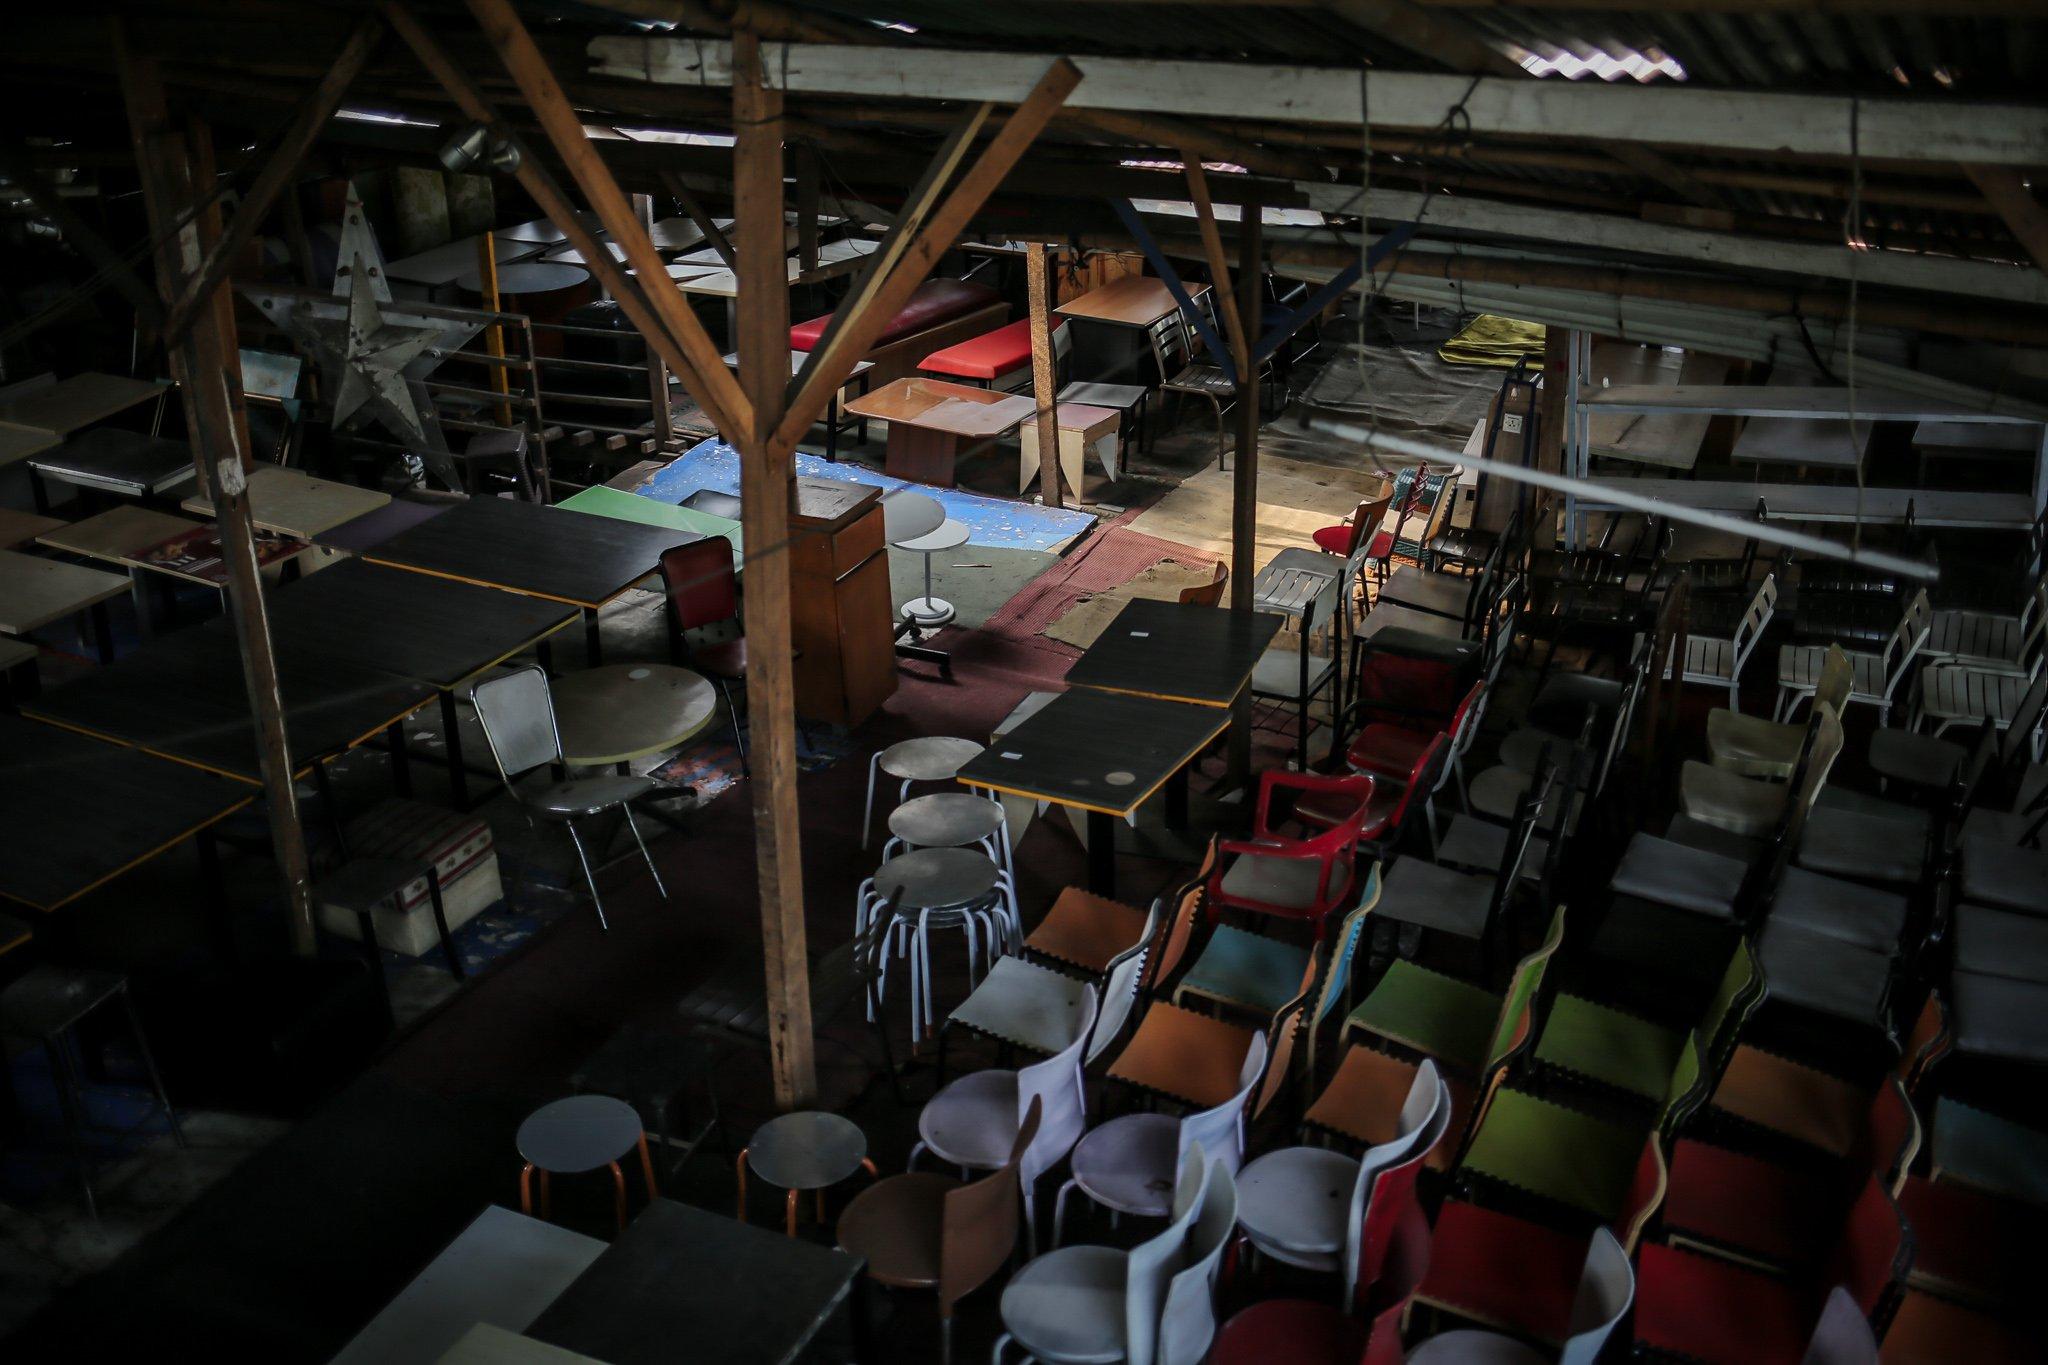 Berbagai jenis macam meja dan kursi dijejerkan di Mal Rongsok Beji, Depok, Jawa Barat, Jumat, (17/9/2021). Dinas Lingkungan Hidup (DLH) DKI Jakarta mencatat limbah eletronik pada periode Februari sampai dengan Oktober 2020 mencapai 22,6 ton atau sebanyak 22.683 kilogram.